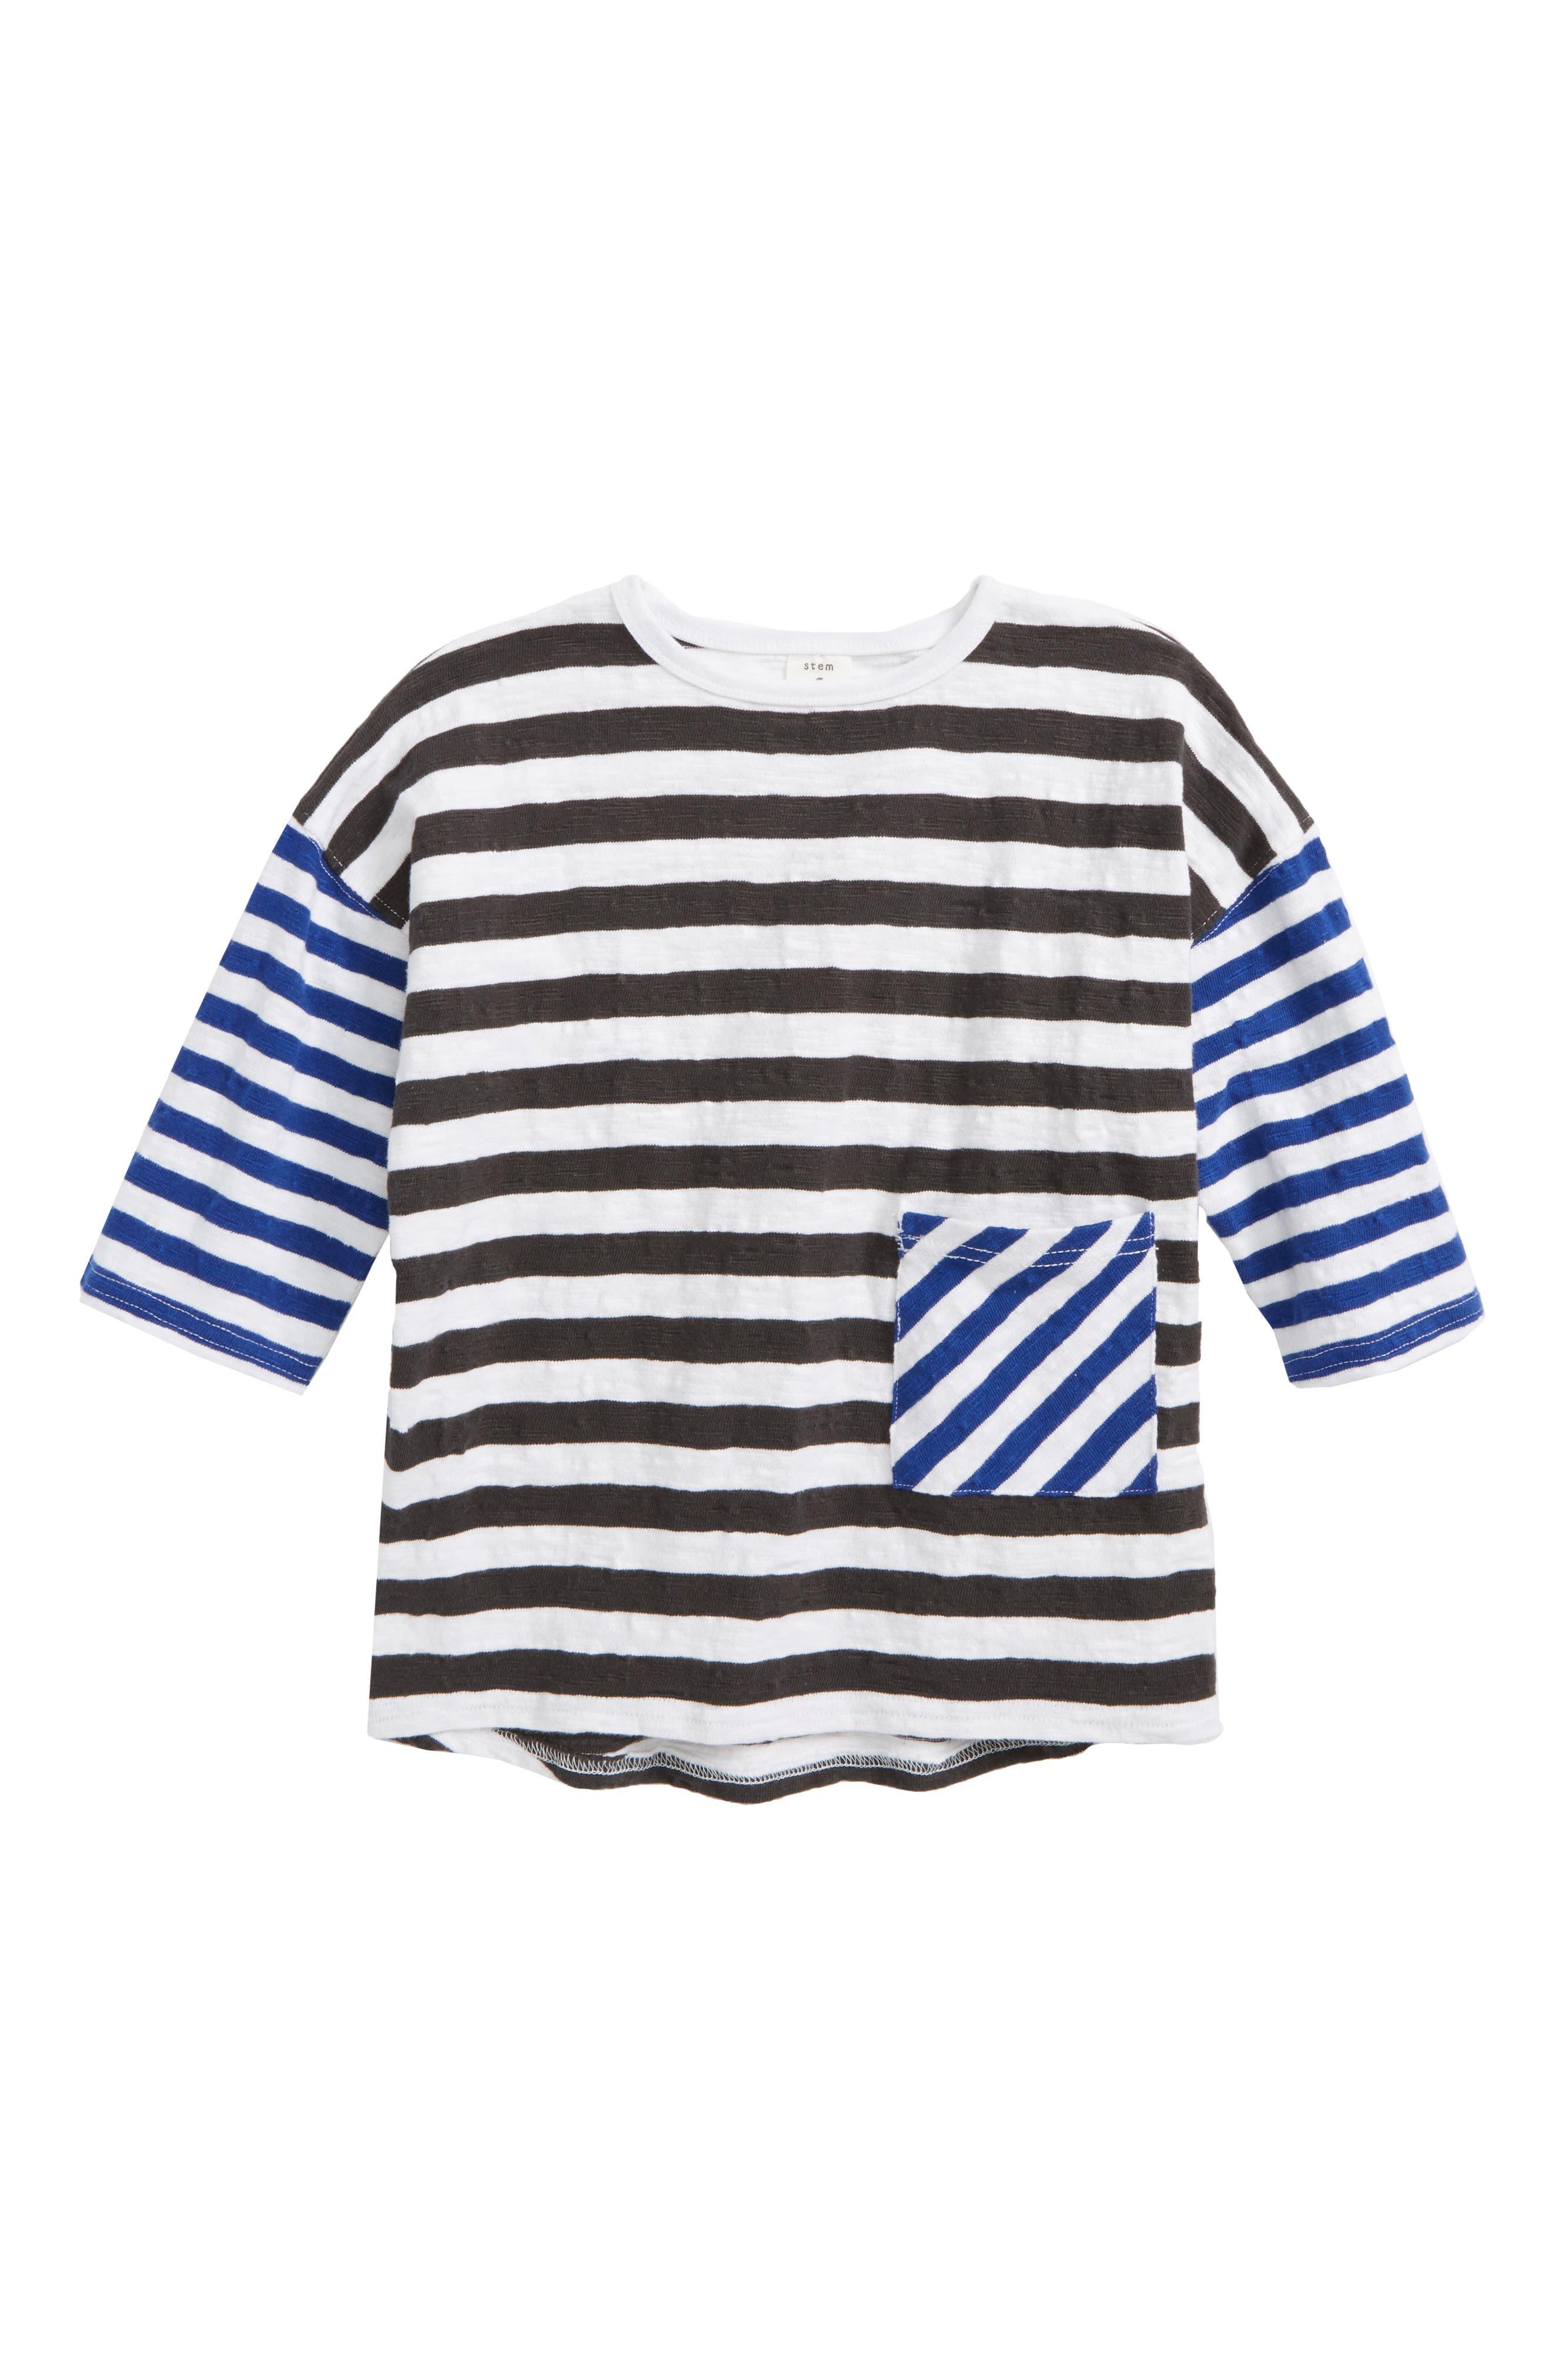 Mixed Stripe Pocket T-Shirt,                         Main,                         color, White Multi Stripe